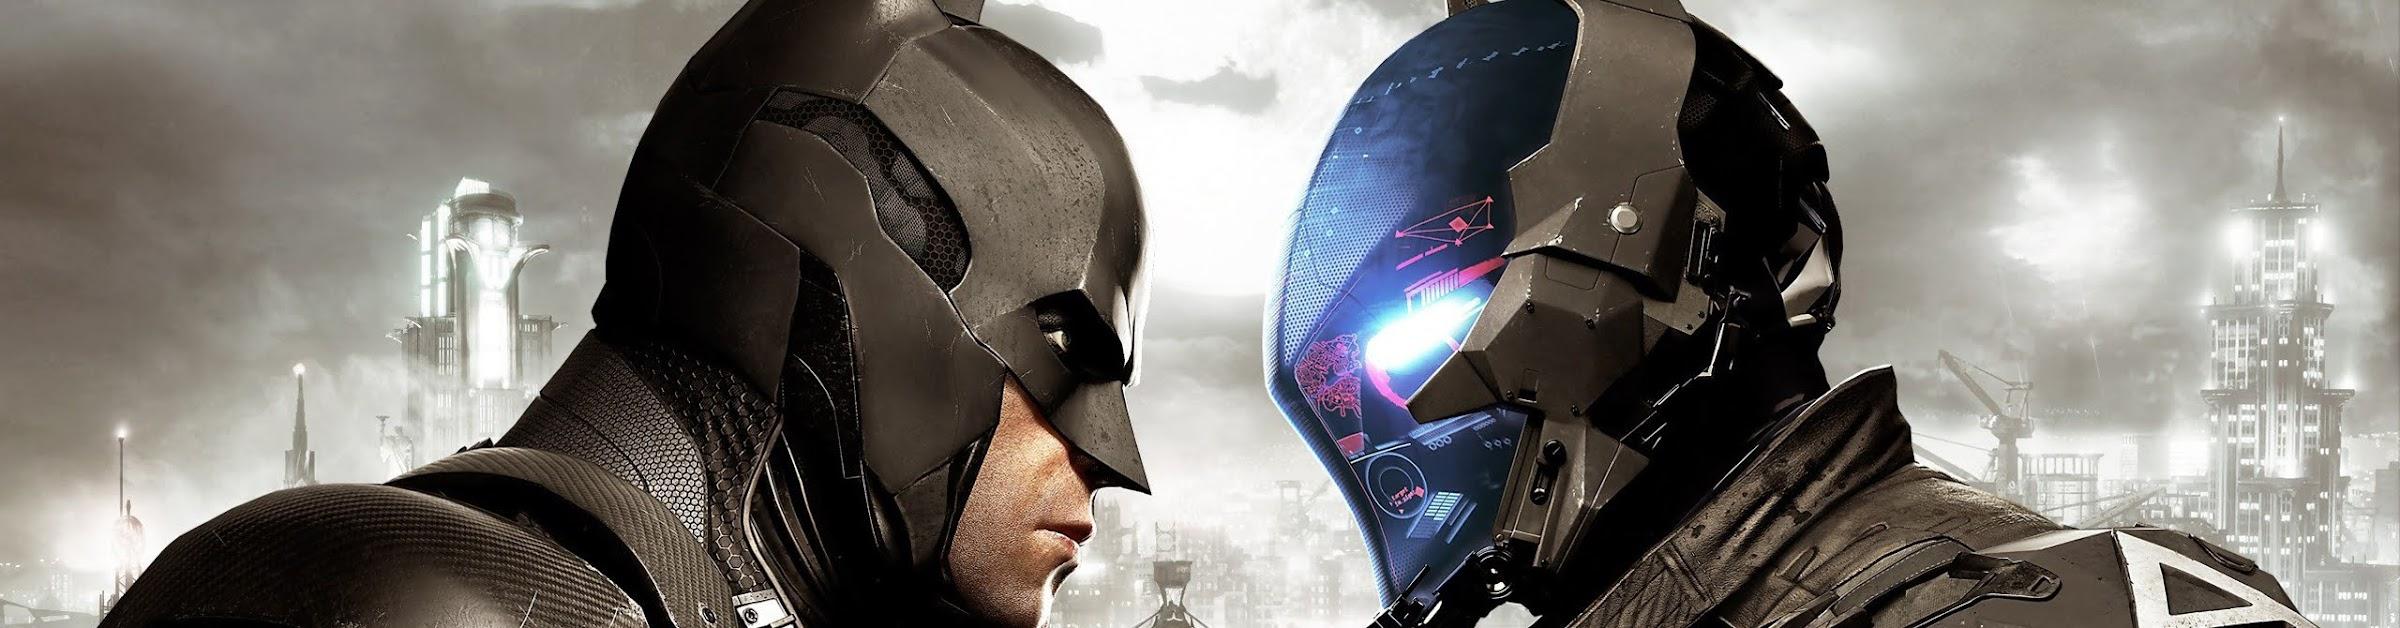 Batman Arkham Knight Việt Ngữ